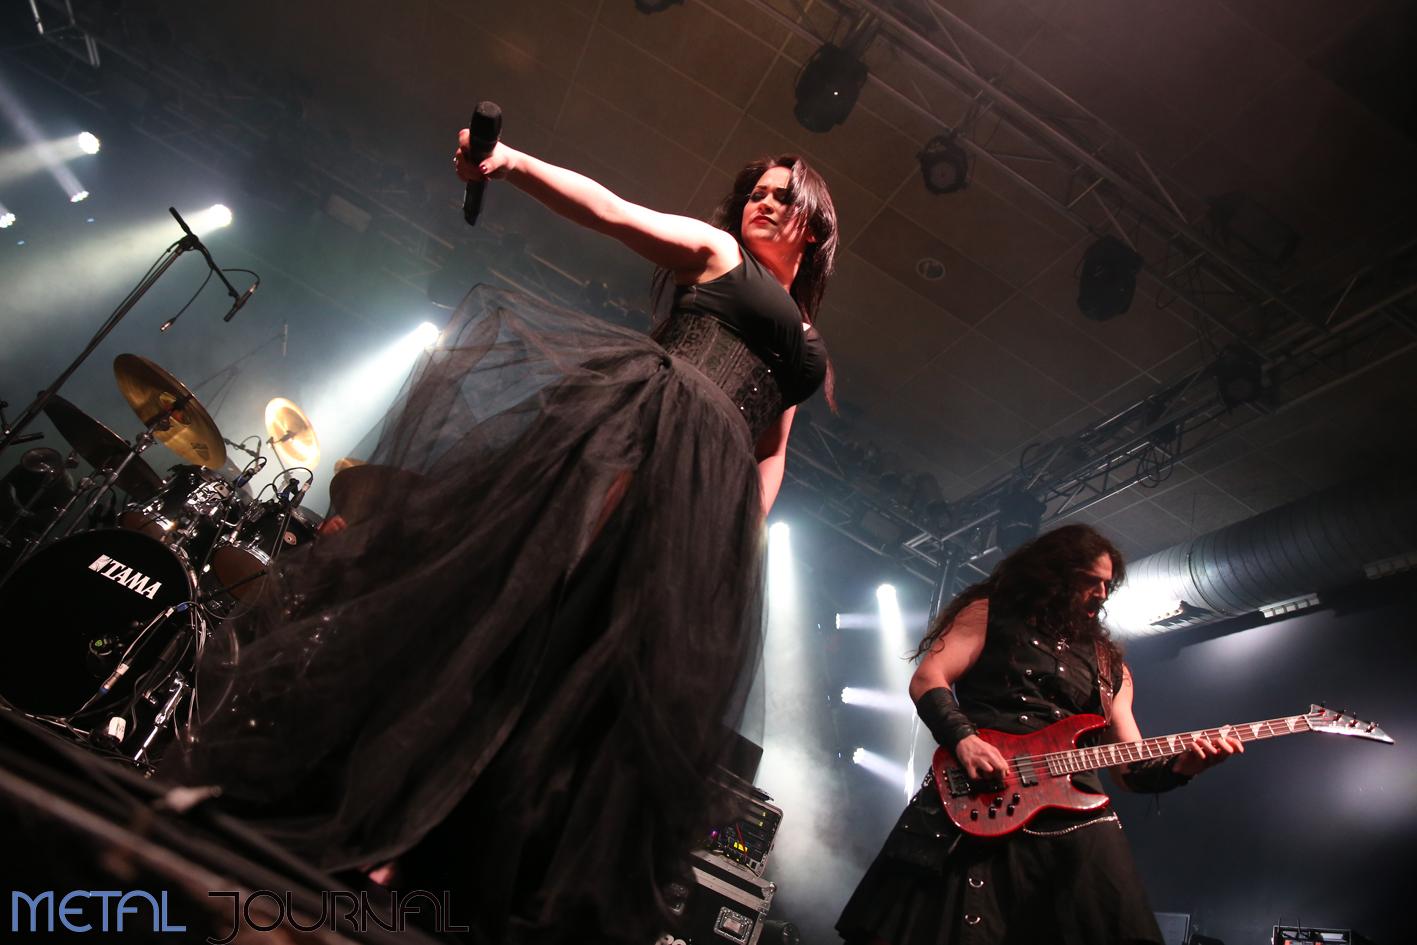 midnight eternal - metal journal bilbao 2018 pic 4